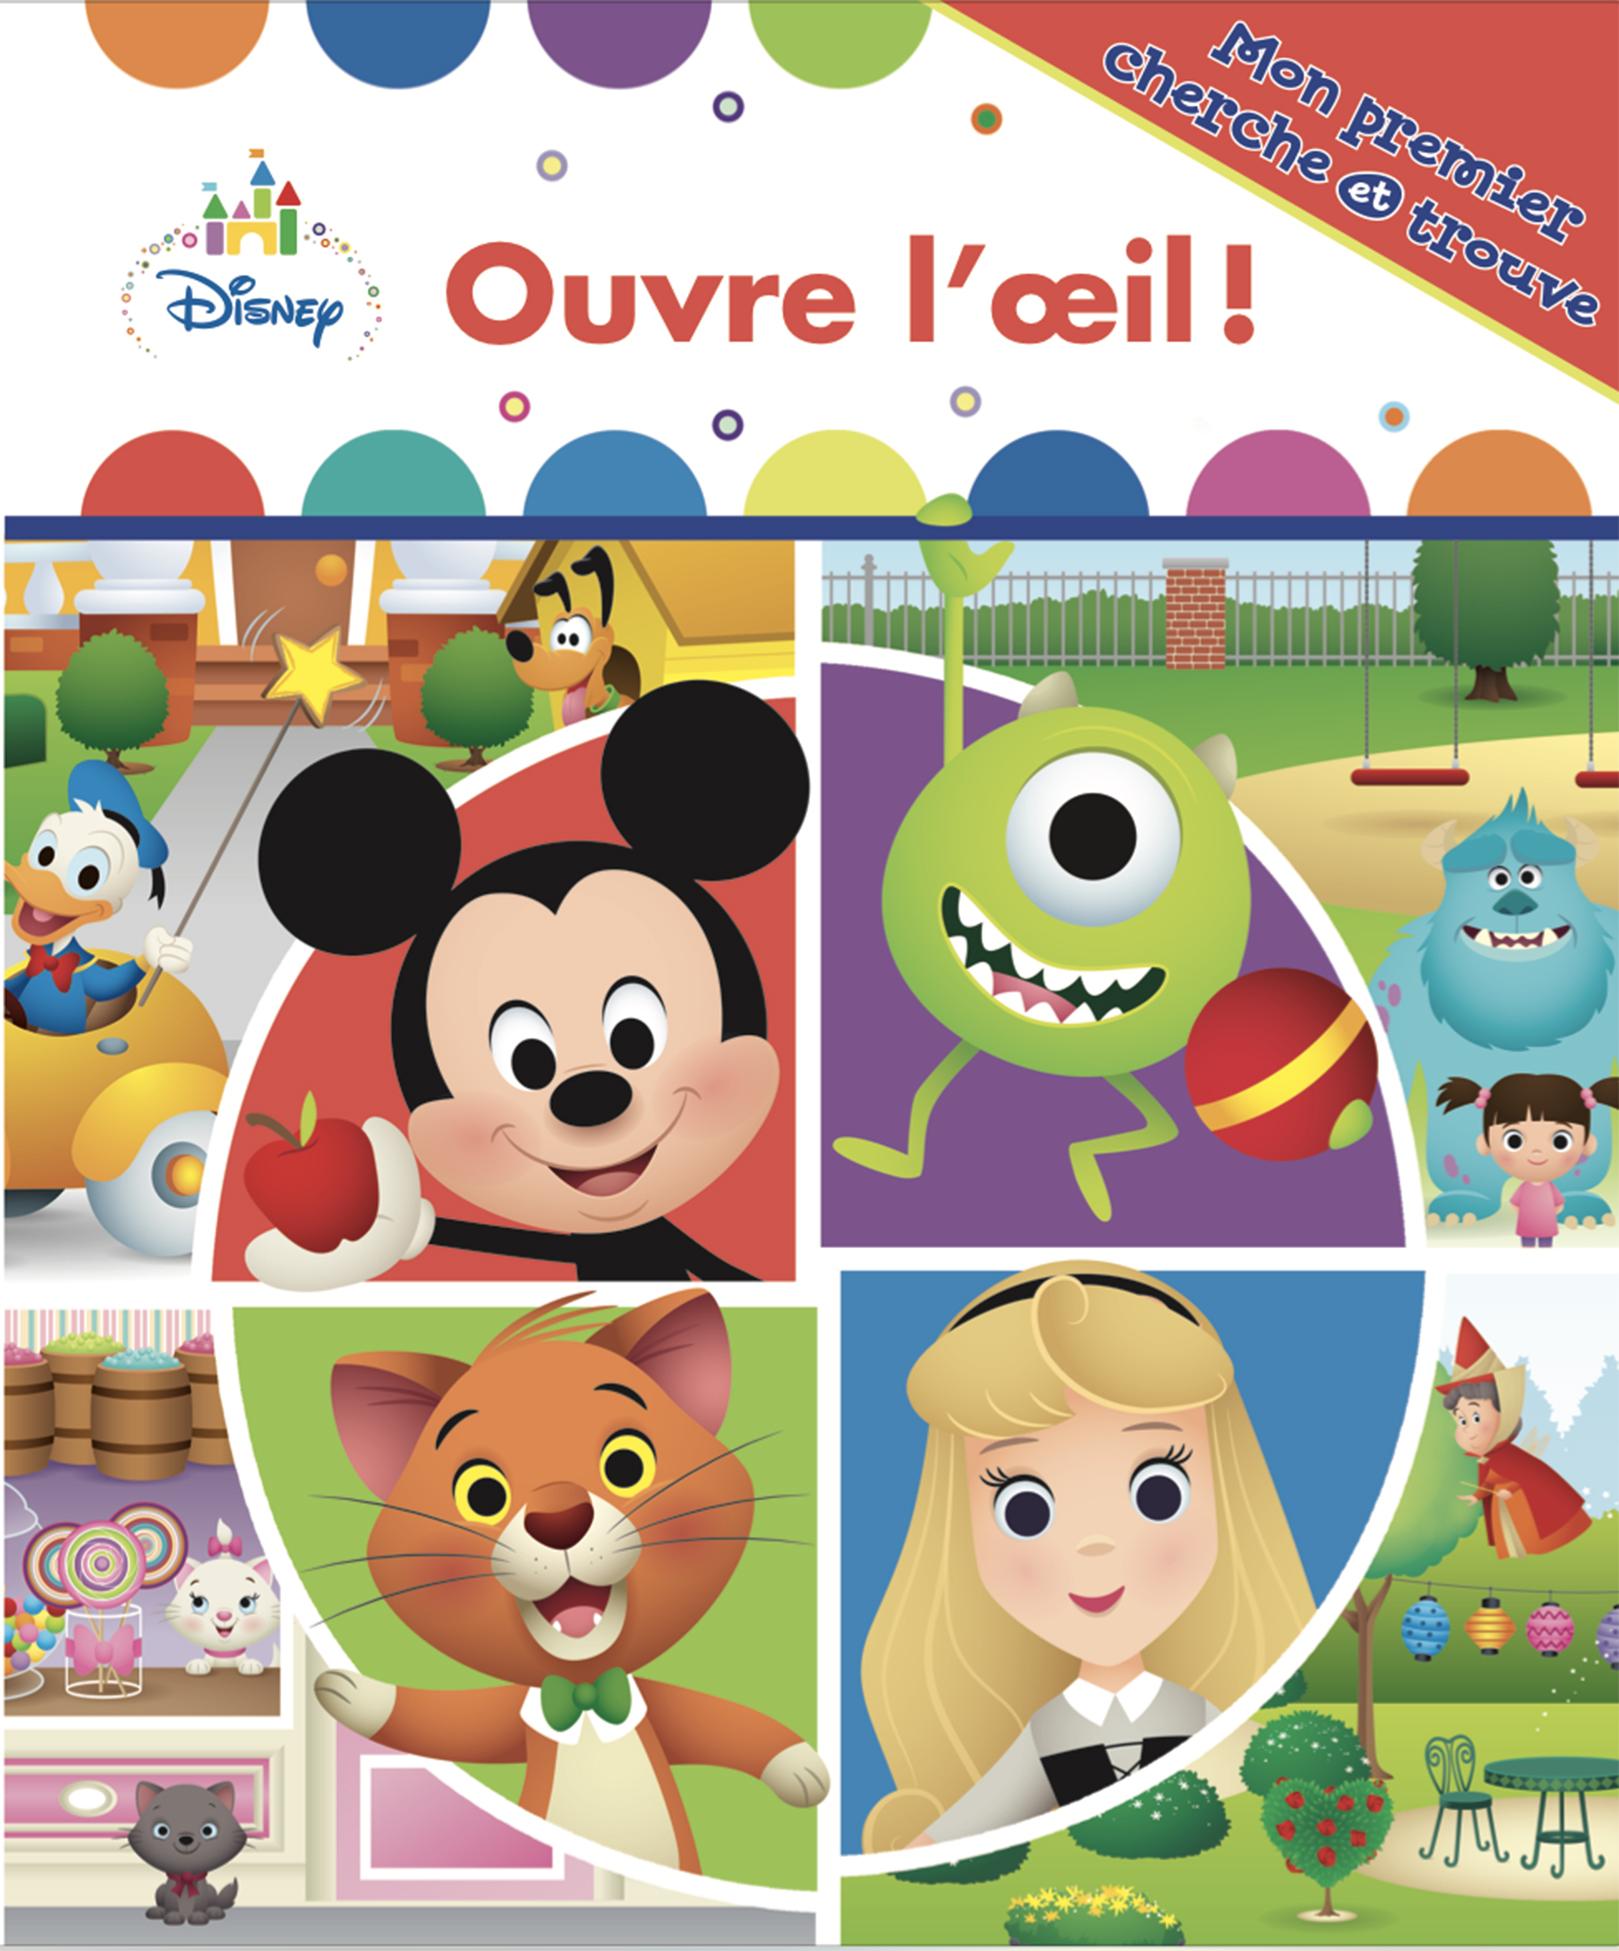 510_OuvreOeil_C1